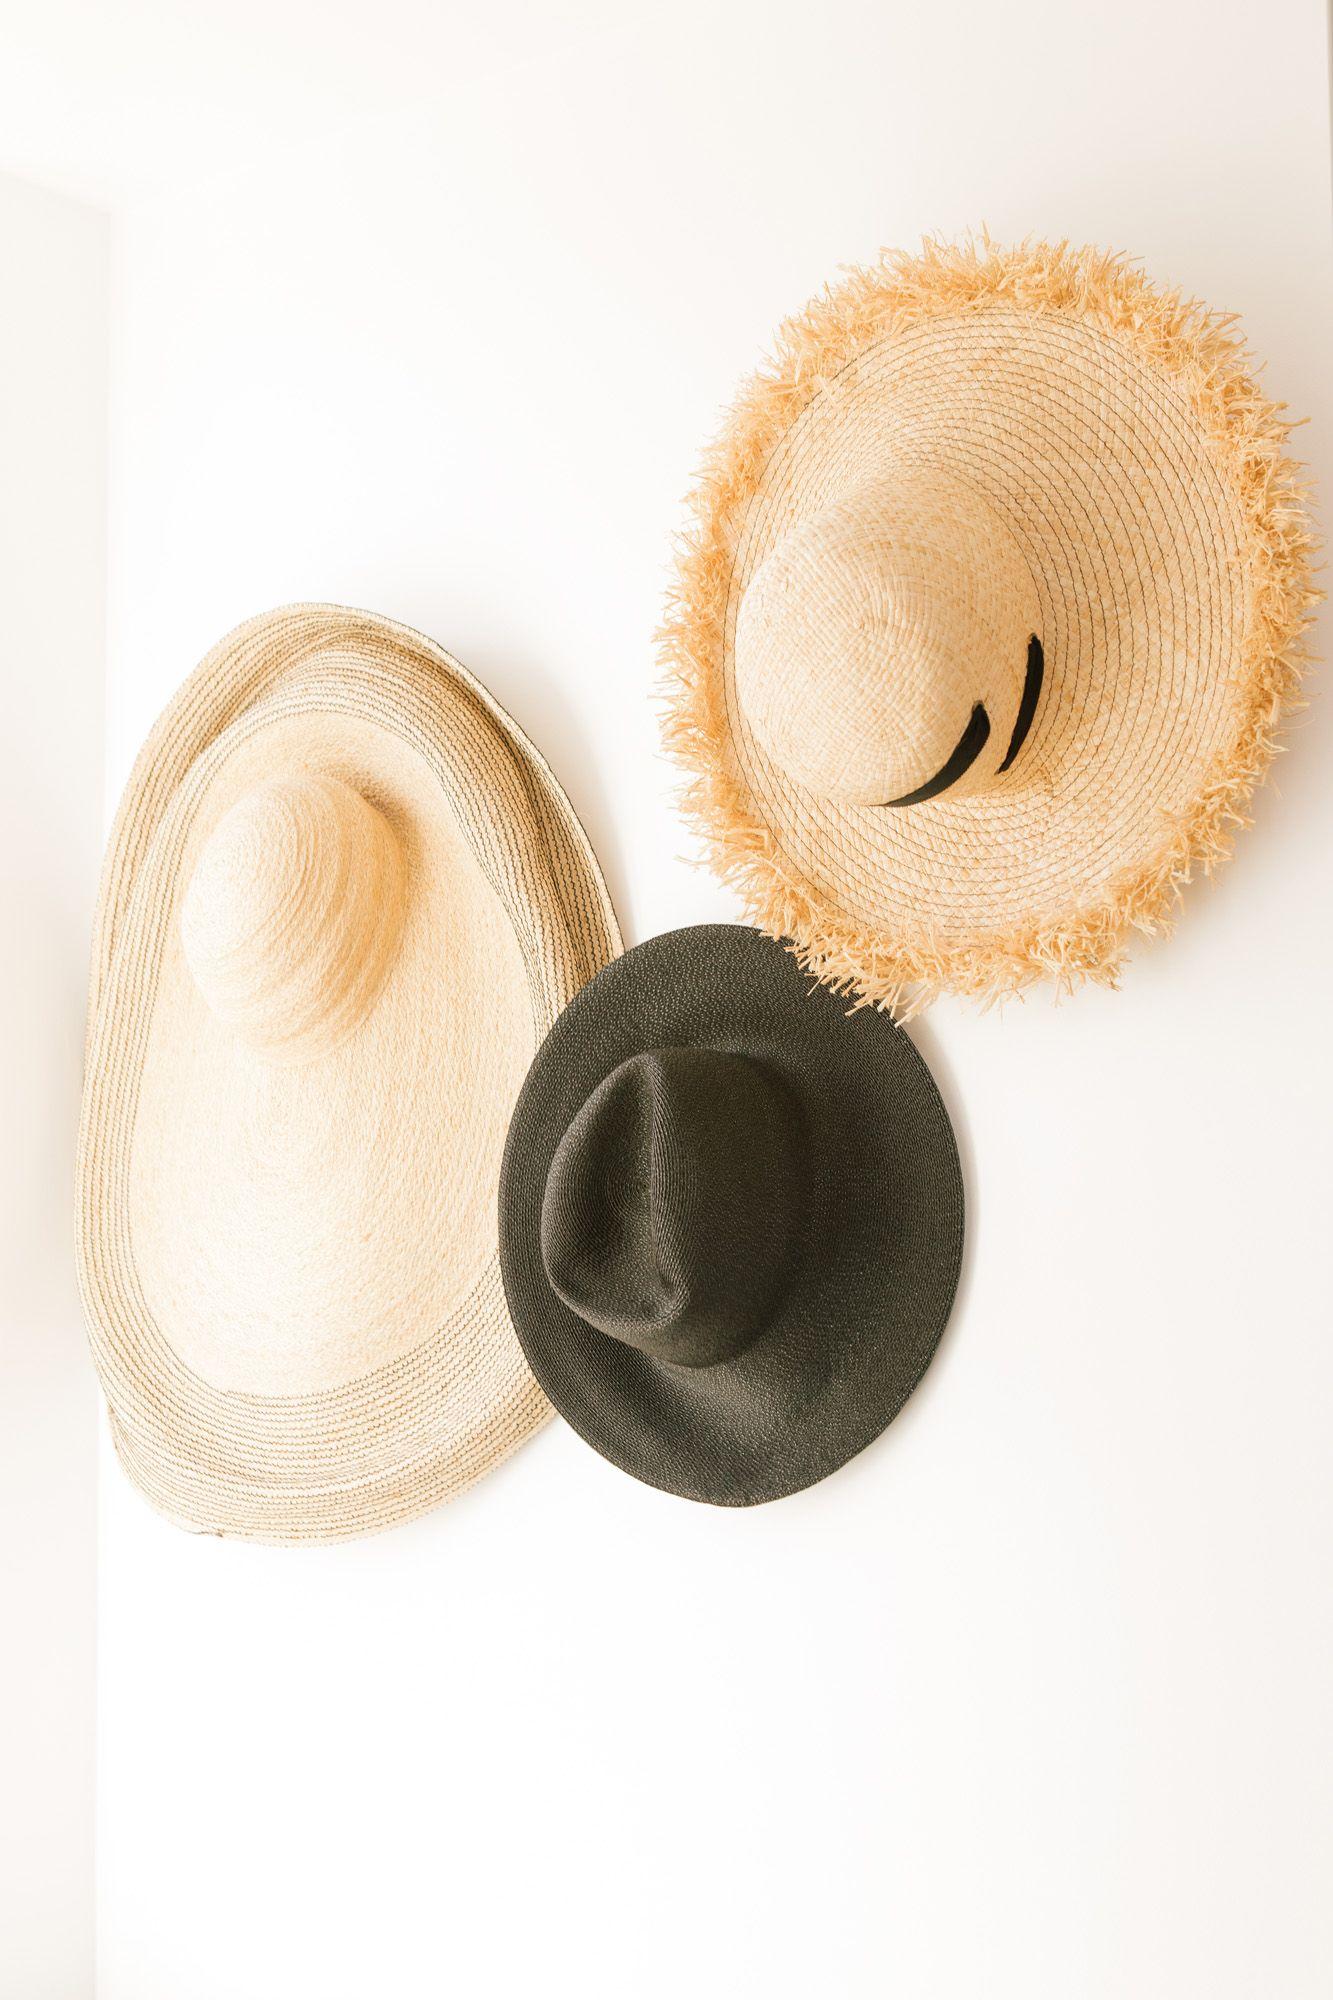 Designer Beach Hats | The 6 Rules To Mastering California Living A Wishlist California